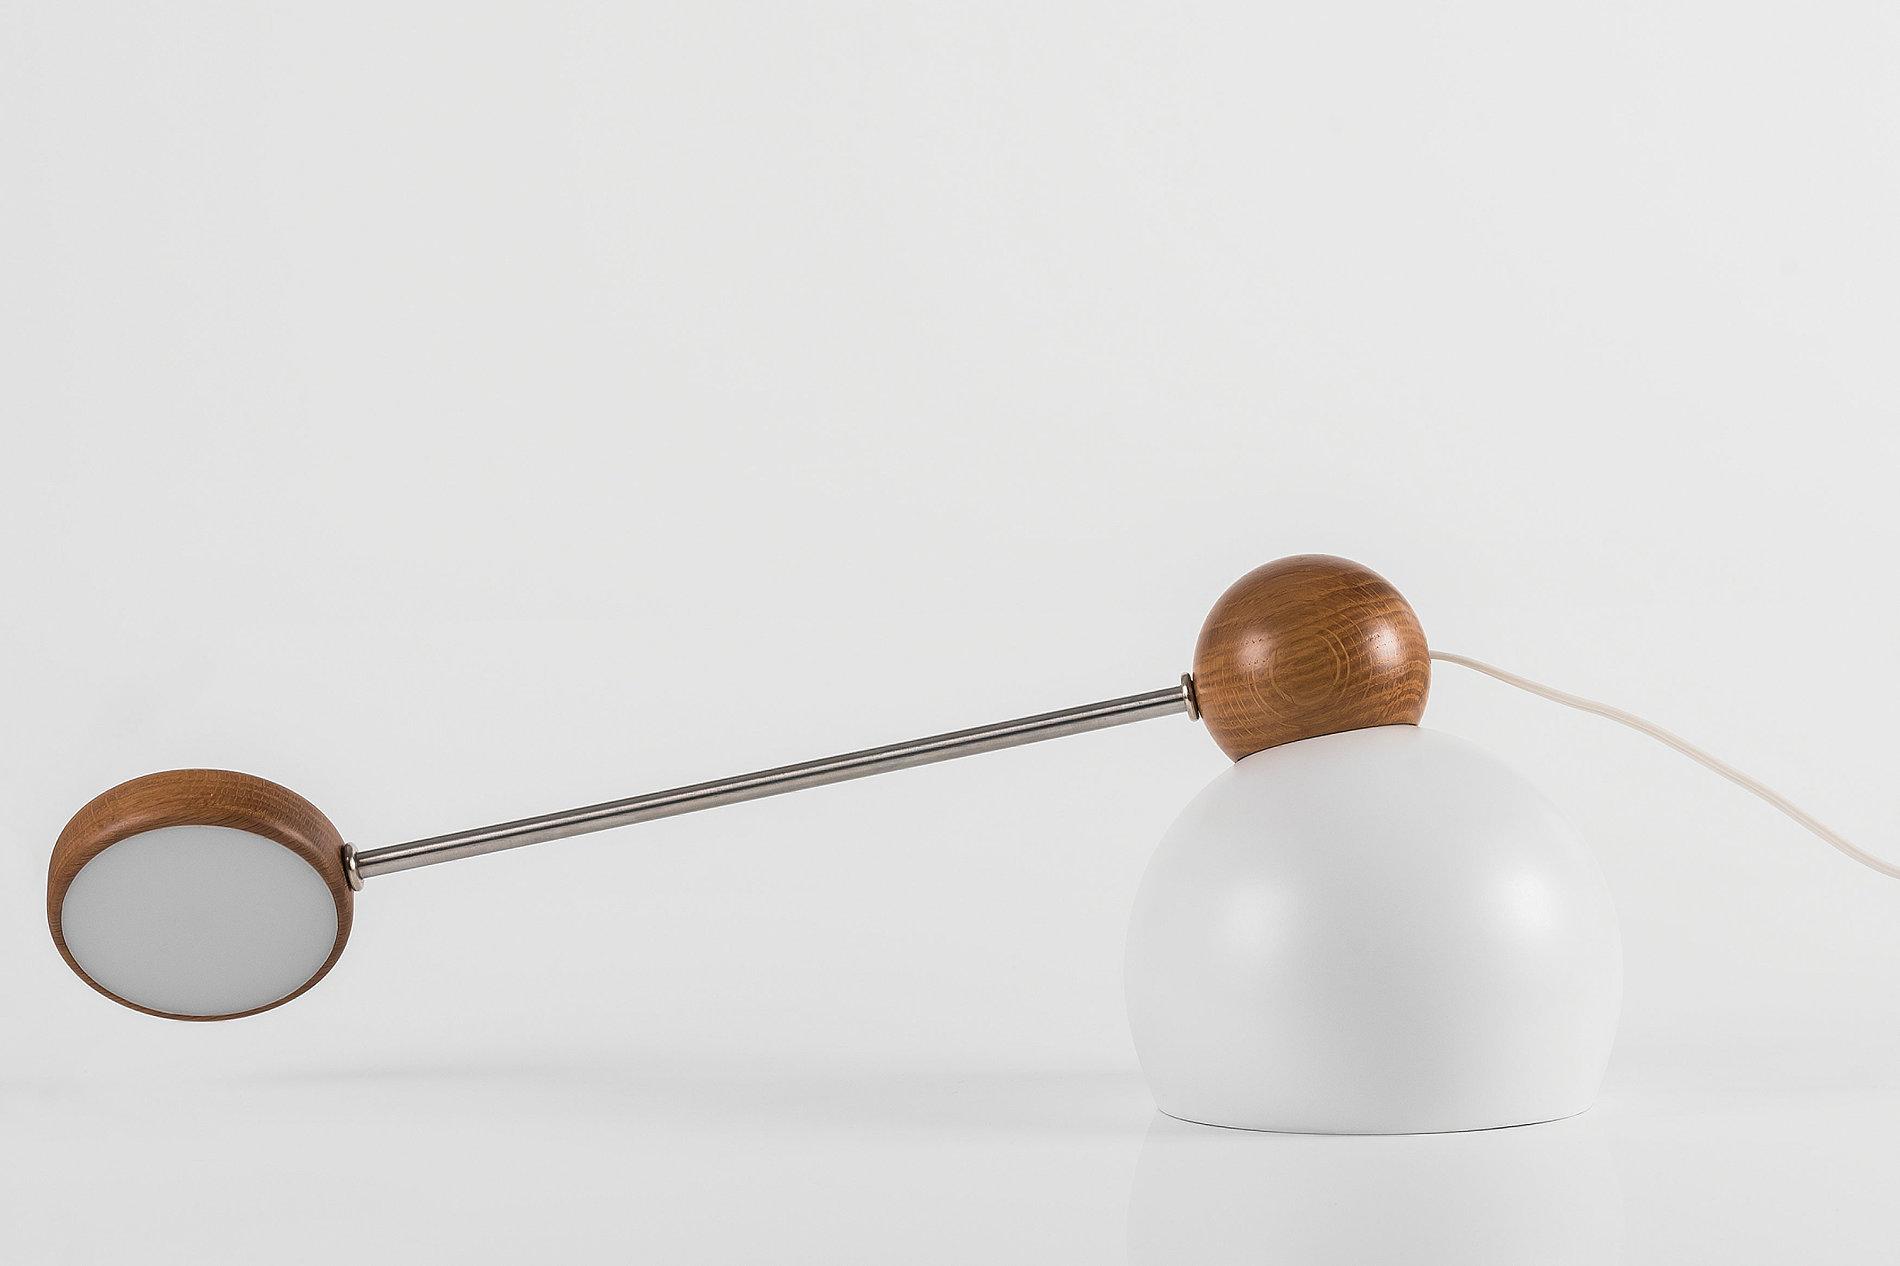 Magnetosphere Desk Lamp | Red Dot Design Award